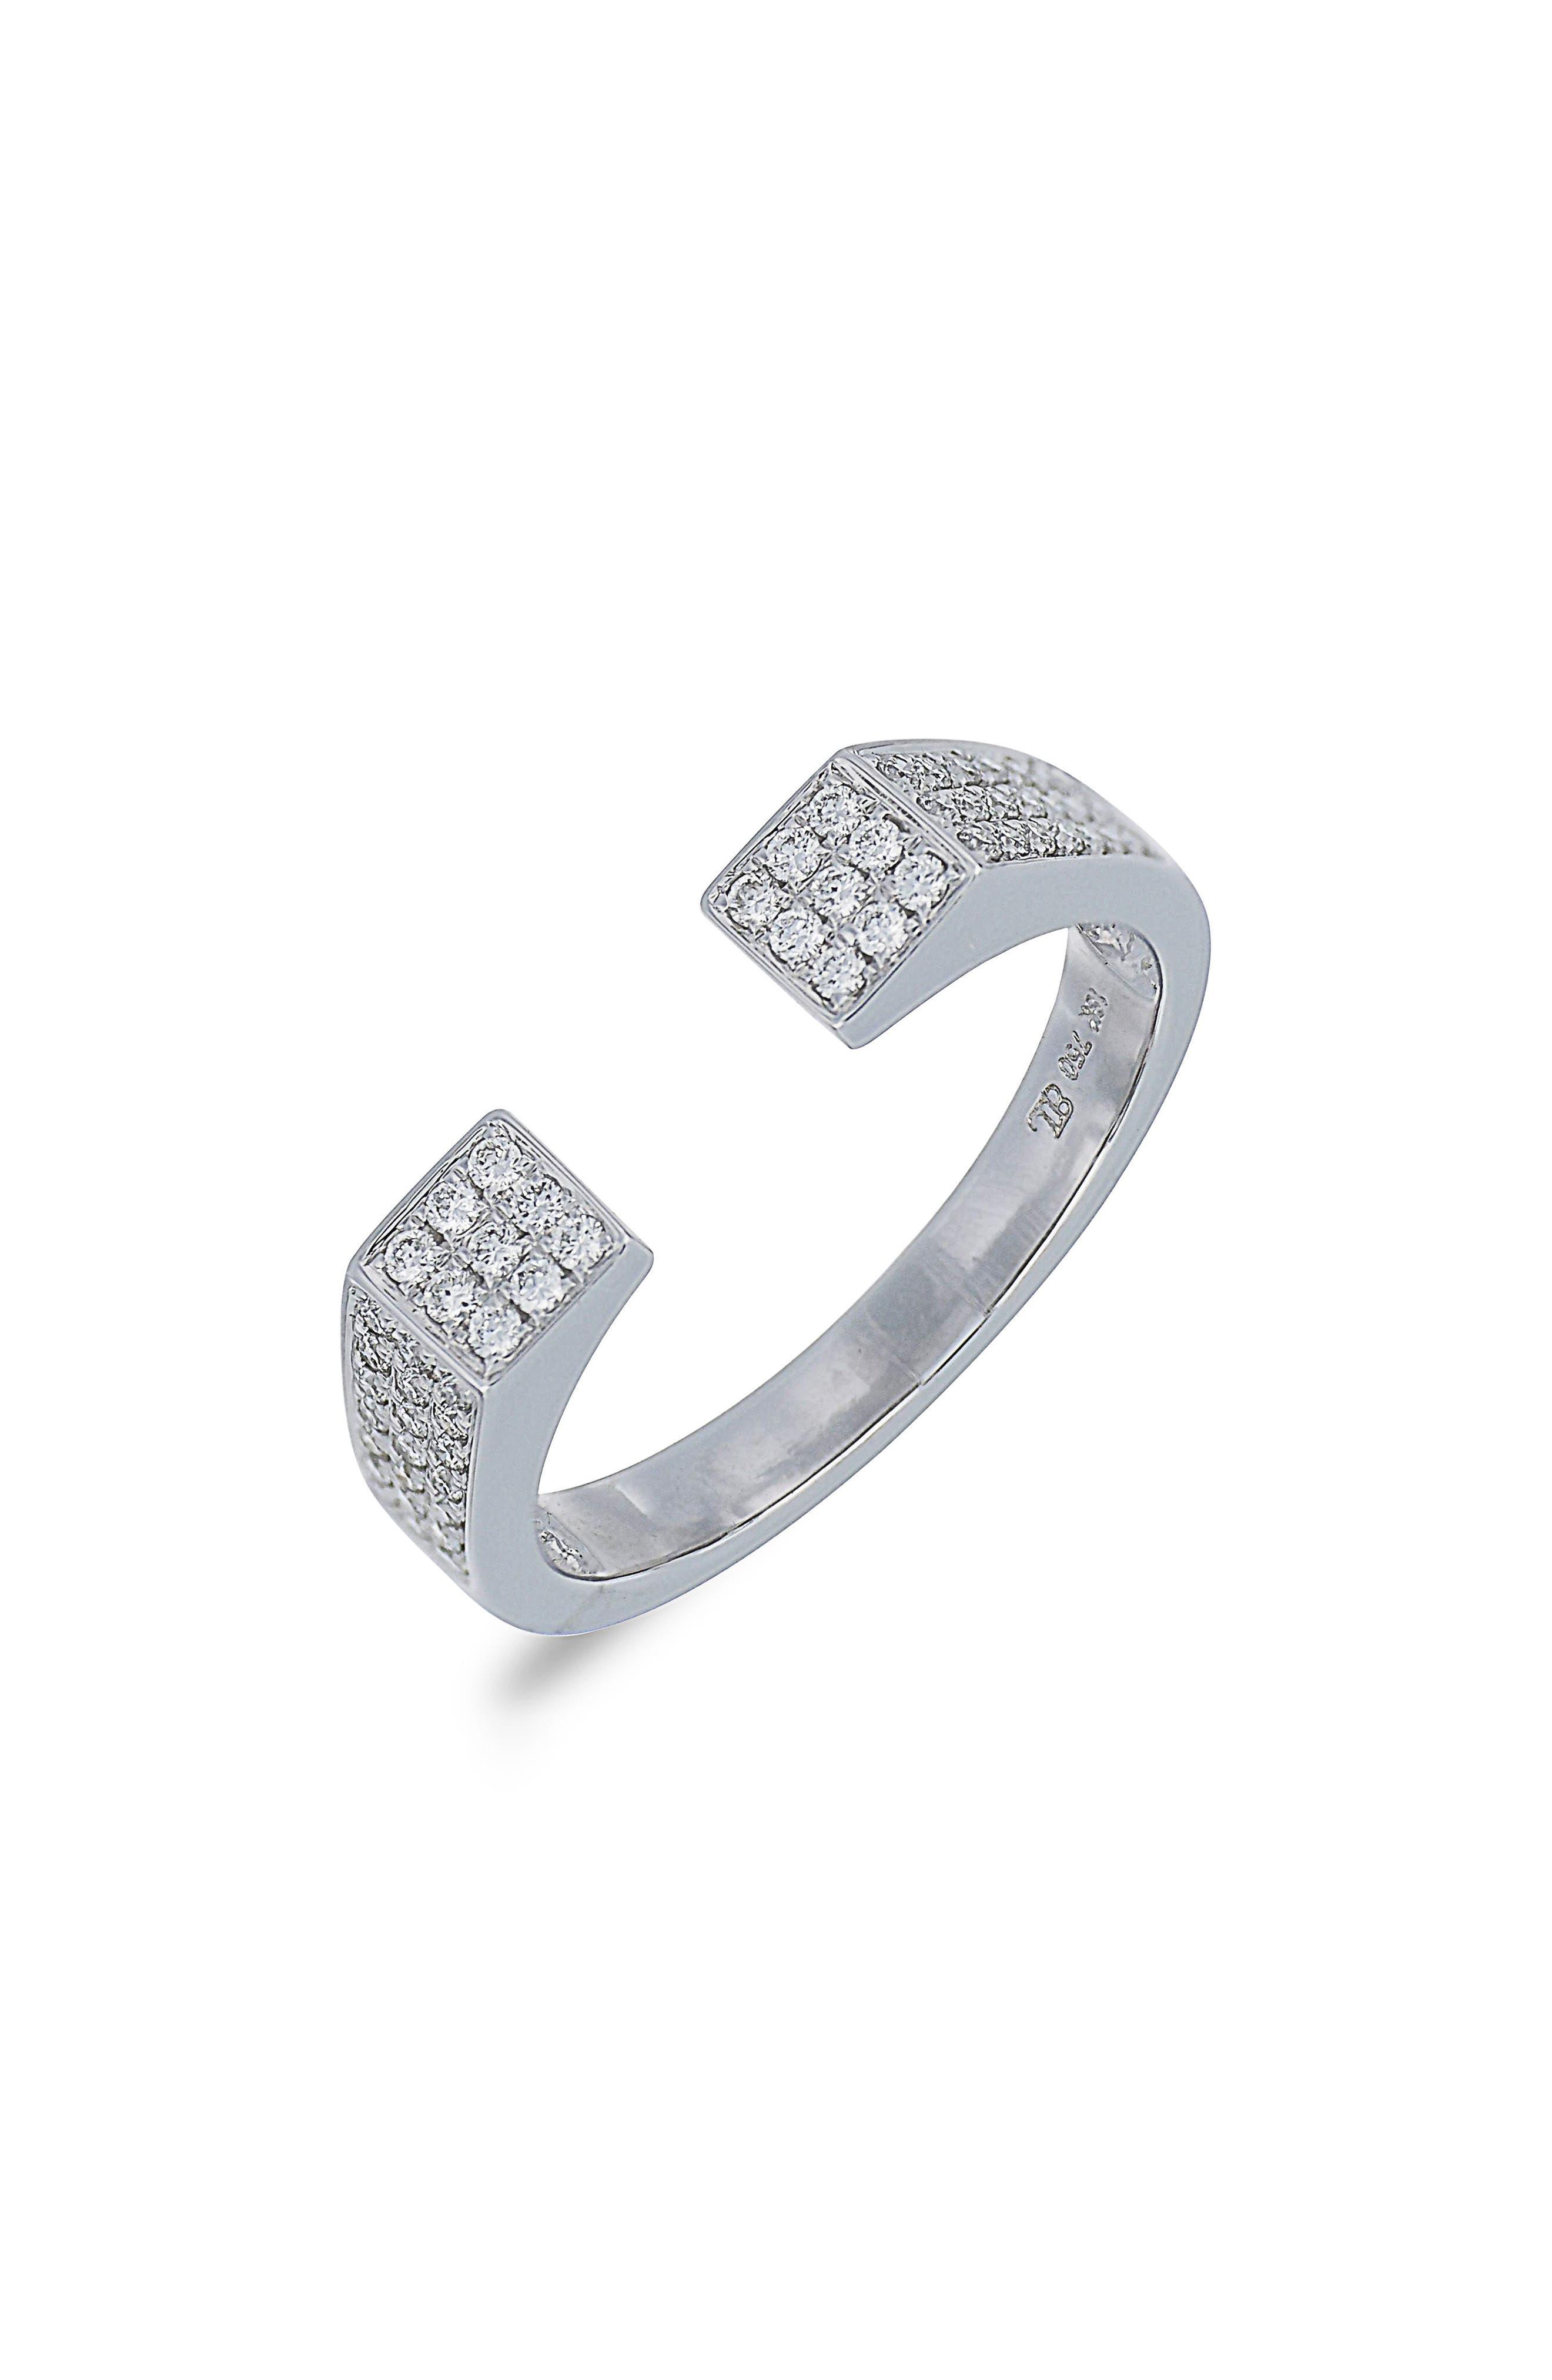 Openwork Diamond Ring,                             Main thumbnail 1, color,                             White Gold